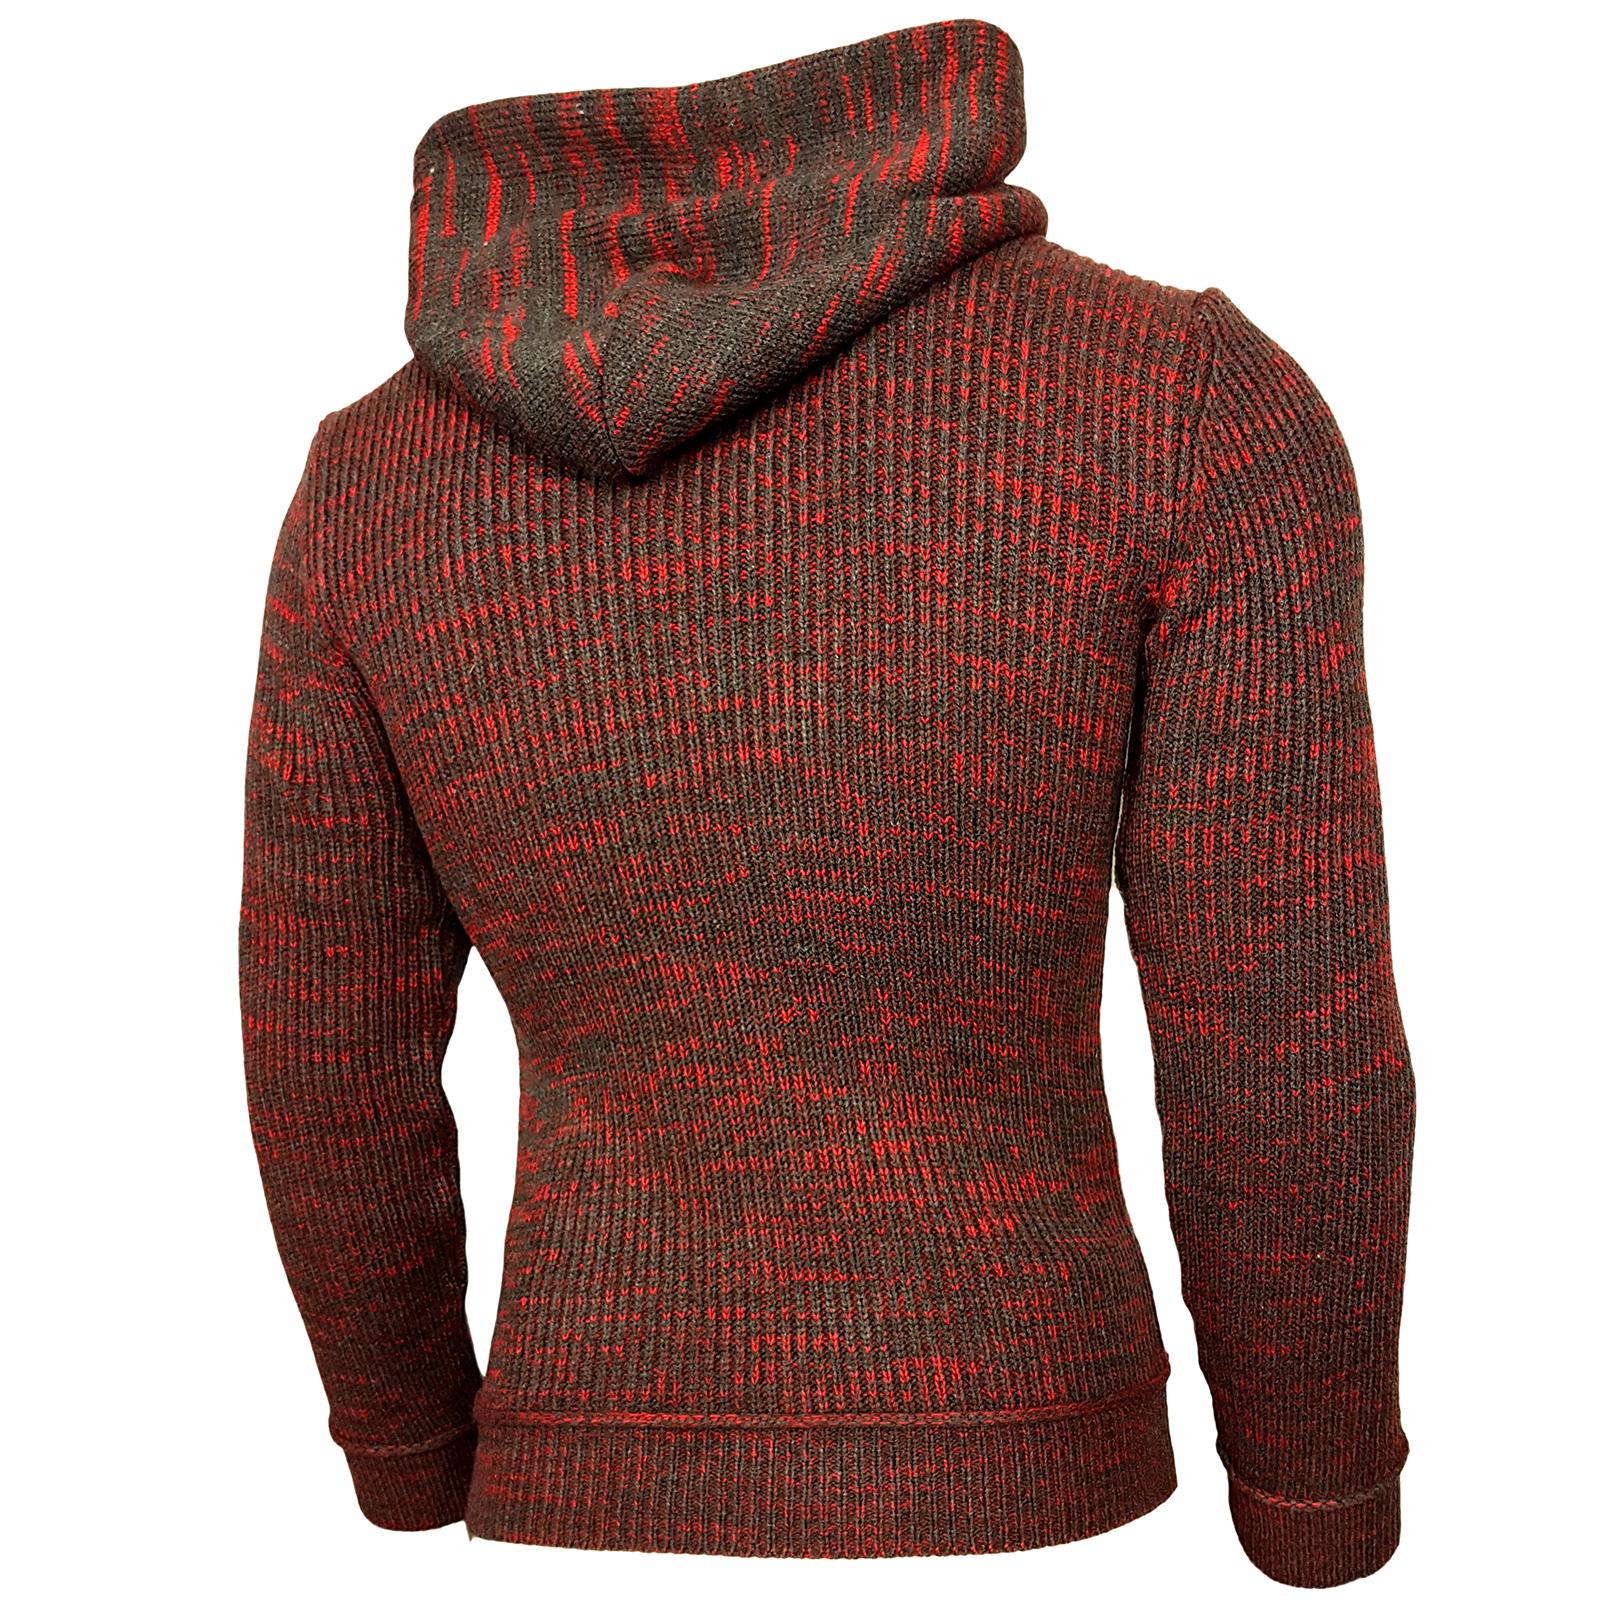 Rusty Neal Herren Sweater 2in1 V-Neck Pullover Sweatshirt Pulli RN-6769-P NEU